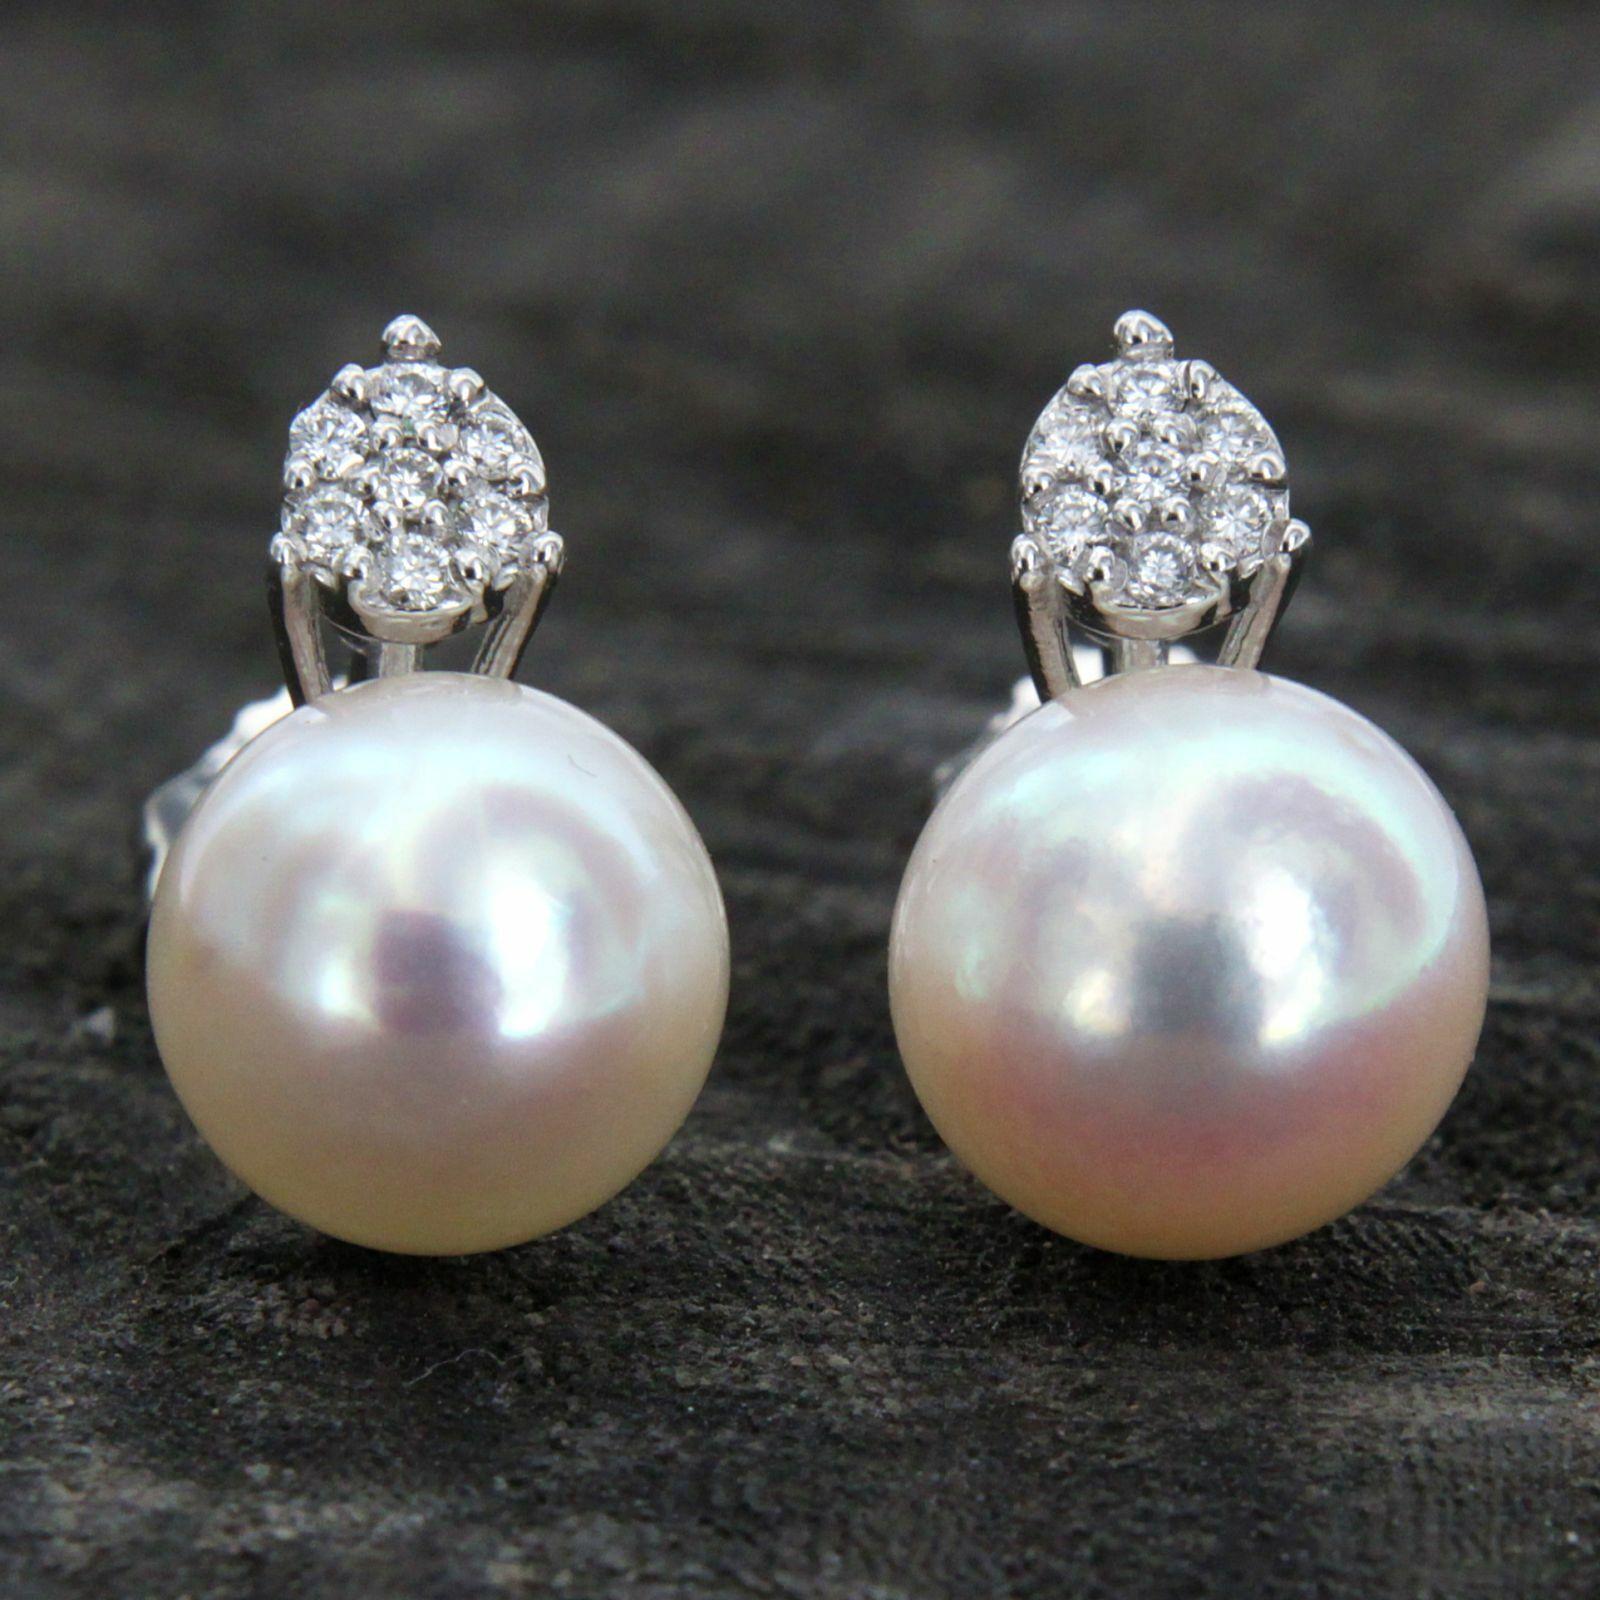 Genuine Pearl /& Diamond Stud Earrings in 14K Solid Yellow Gold Handmade Jewelry Gift